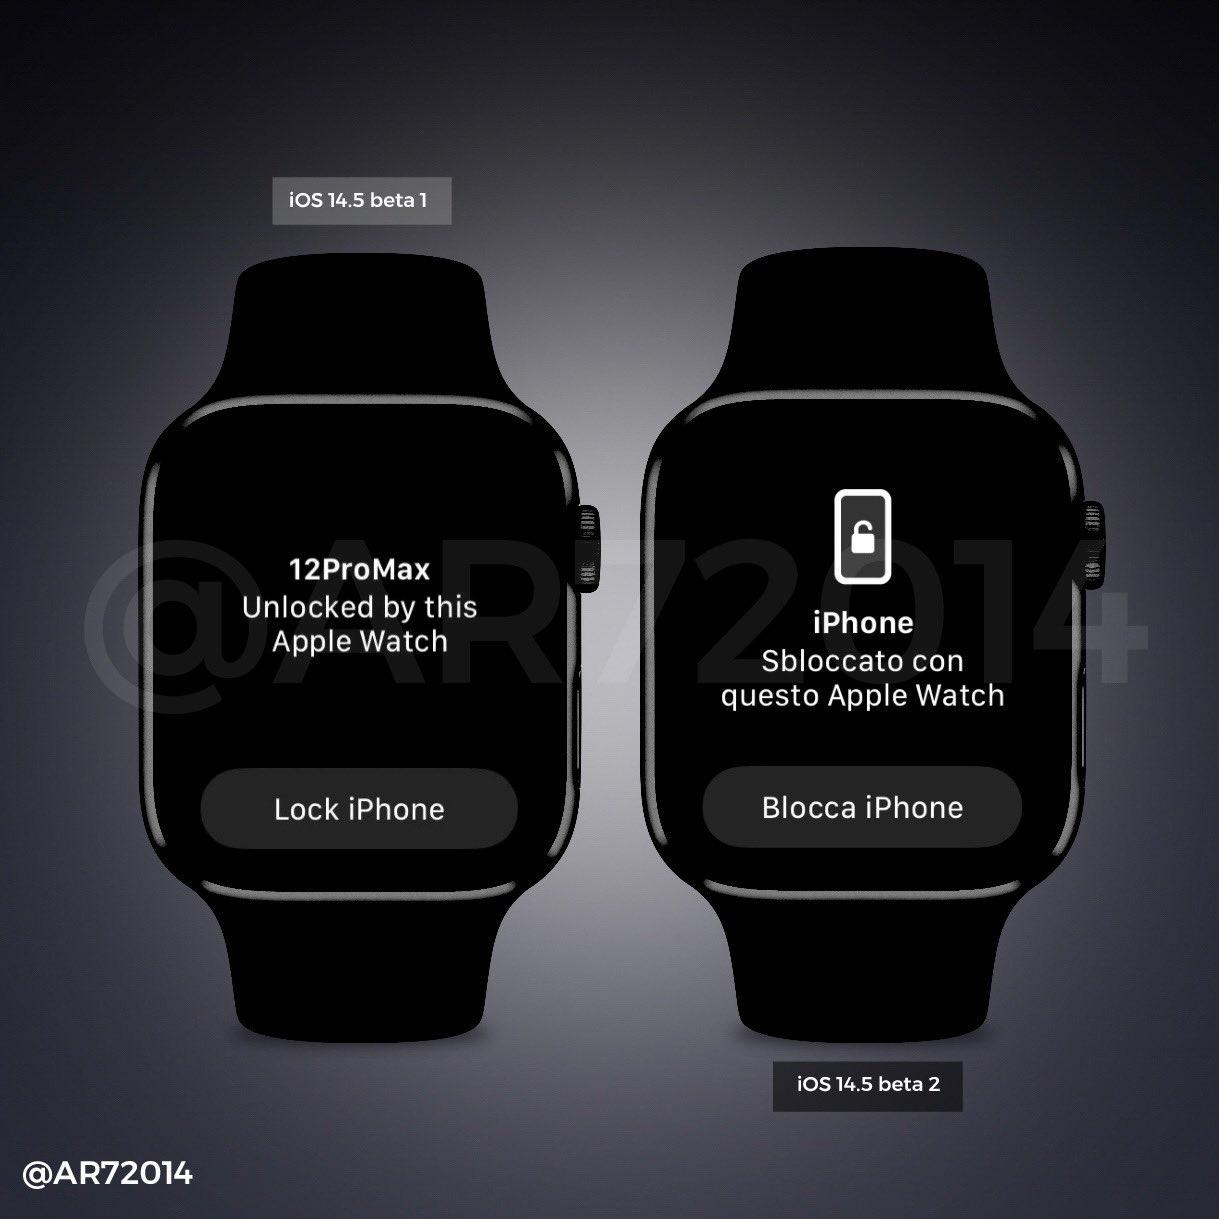 watchOS 7.4 beta unlocked